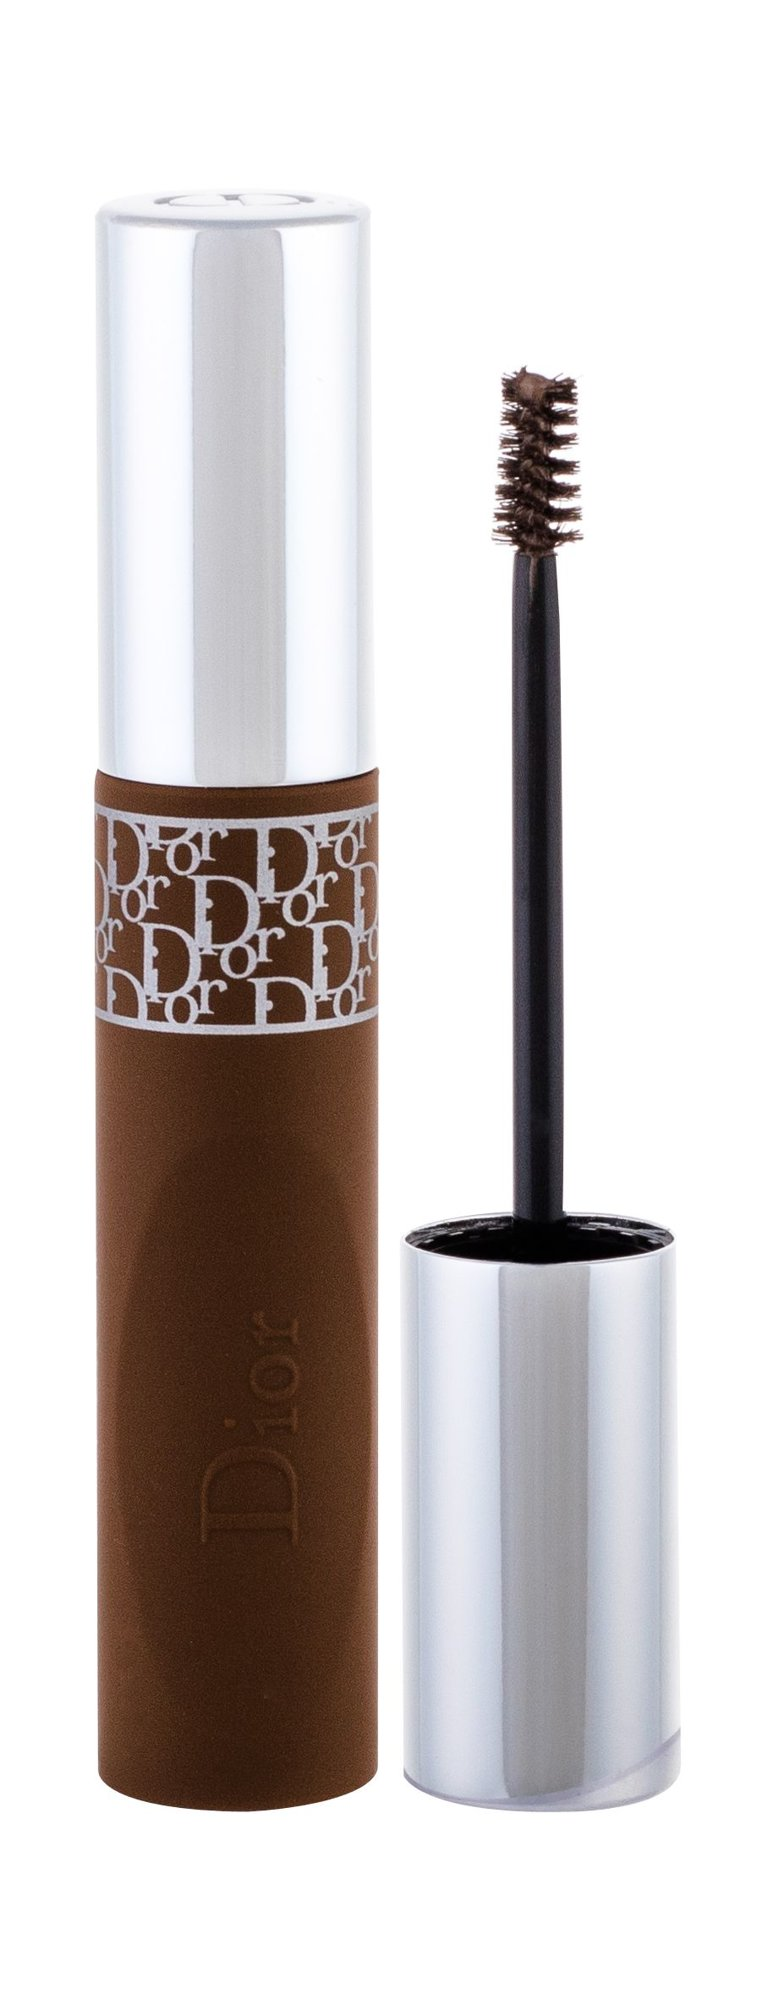 Christian Dior Diorshow Mascara 5ml 021 Chestnut Pump´N´Volume Waterproof